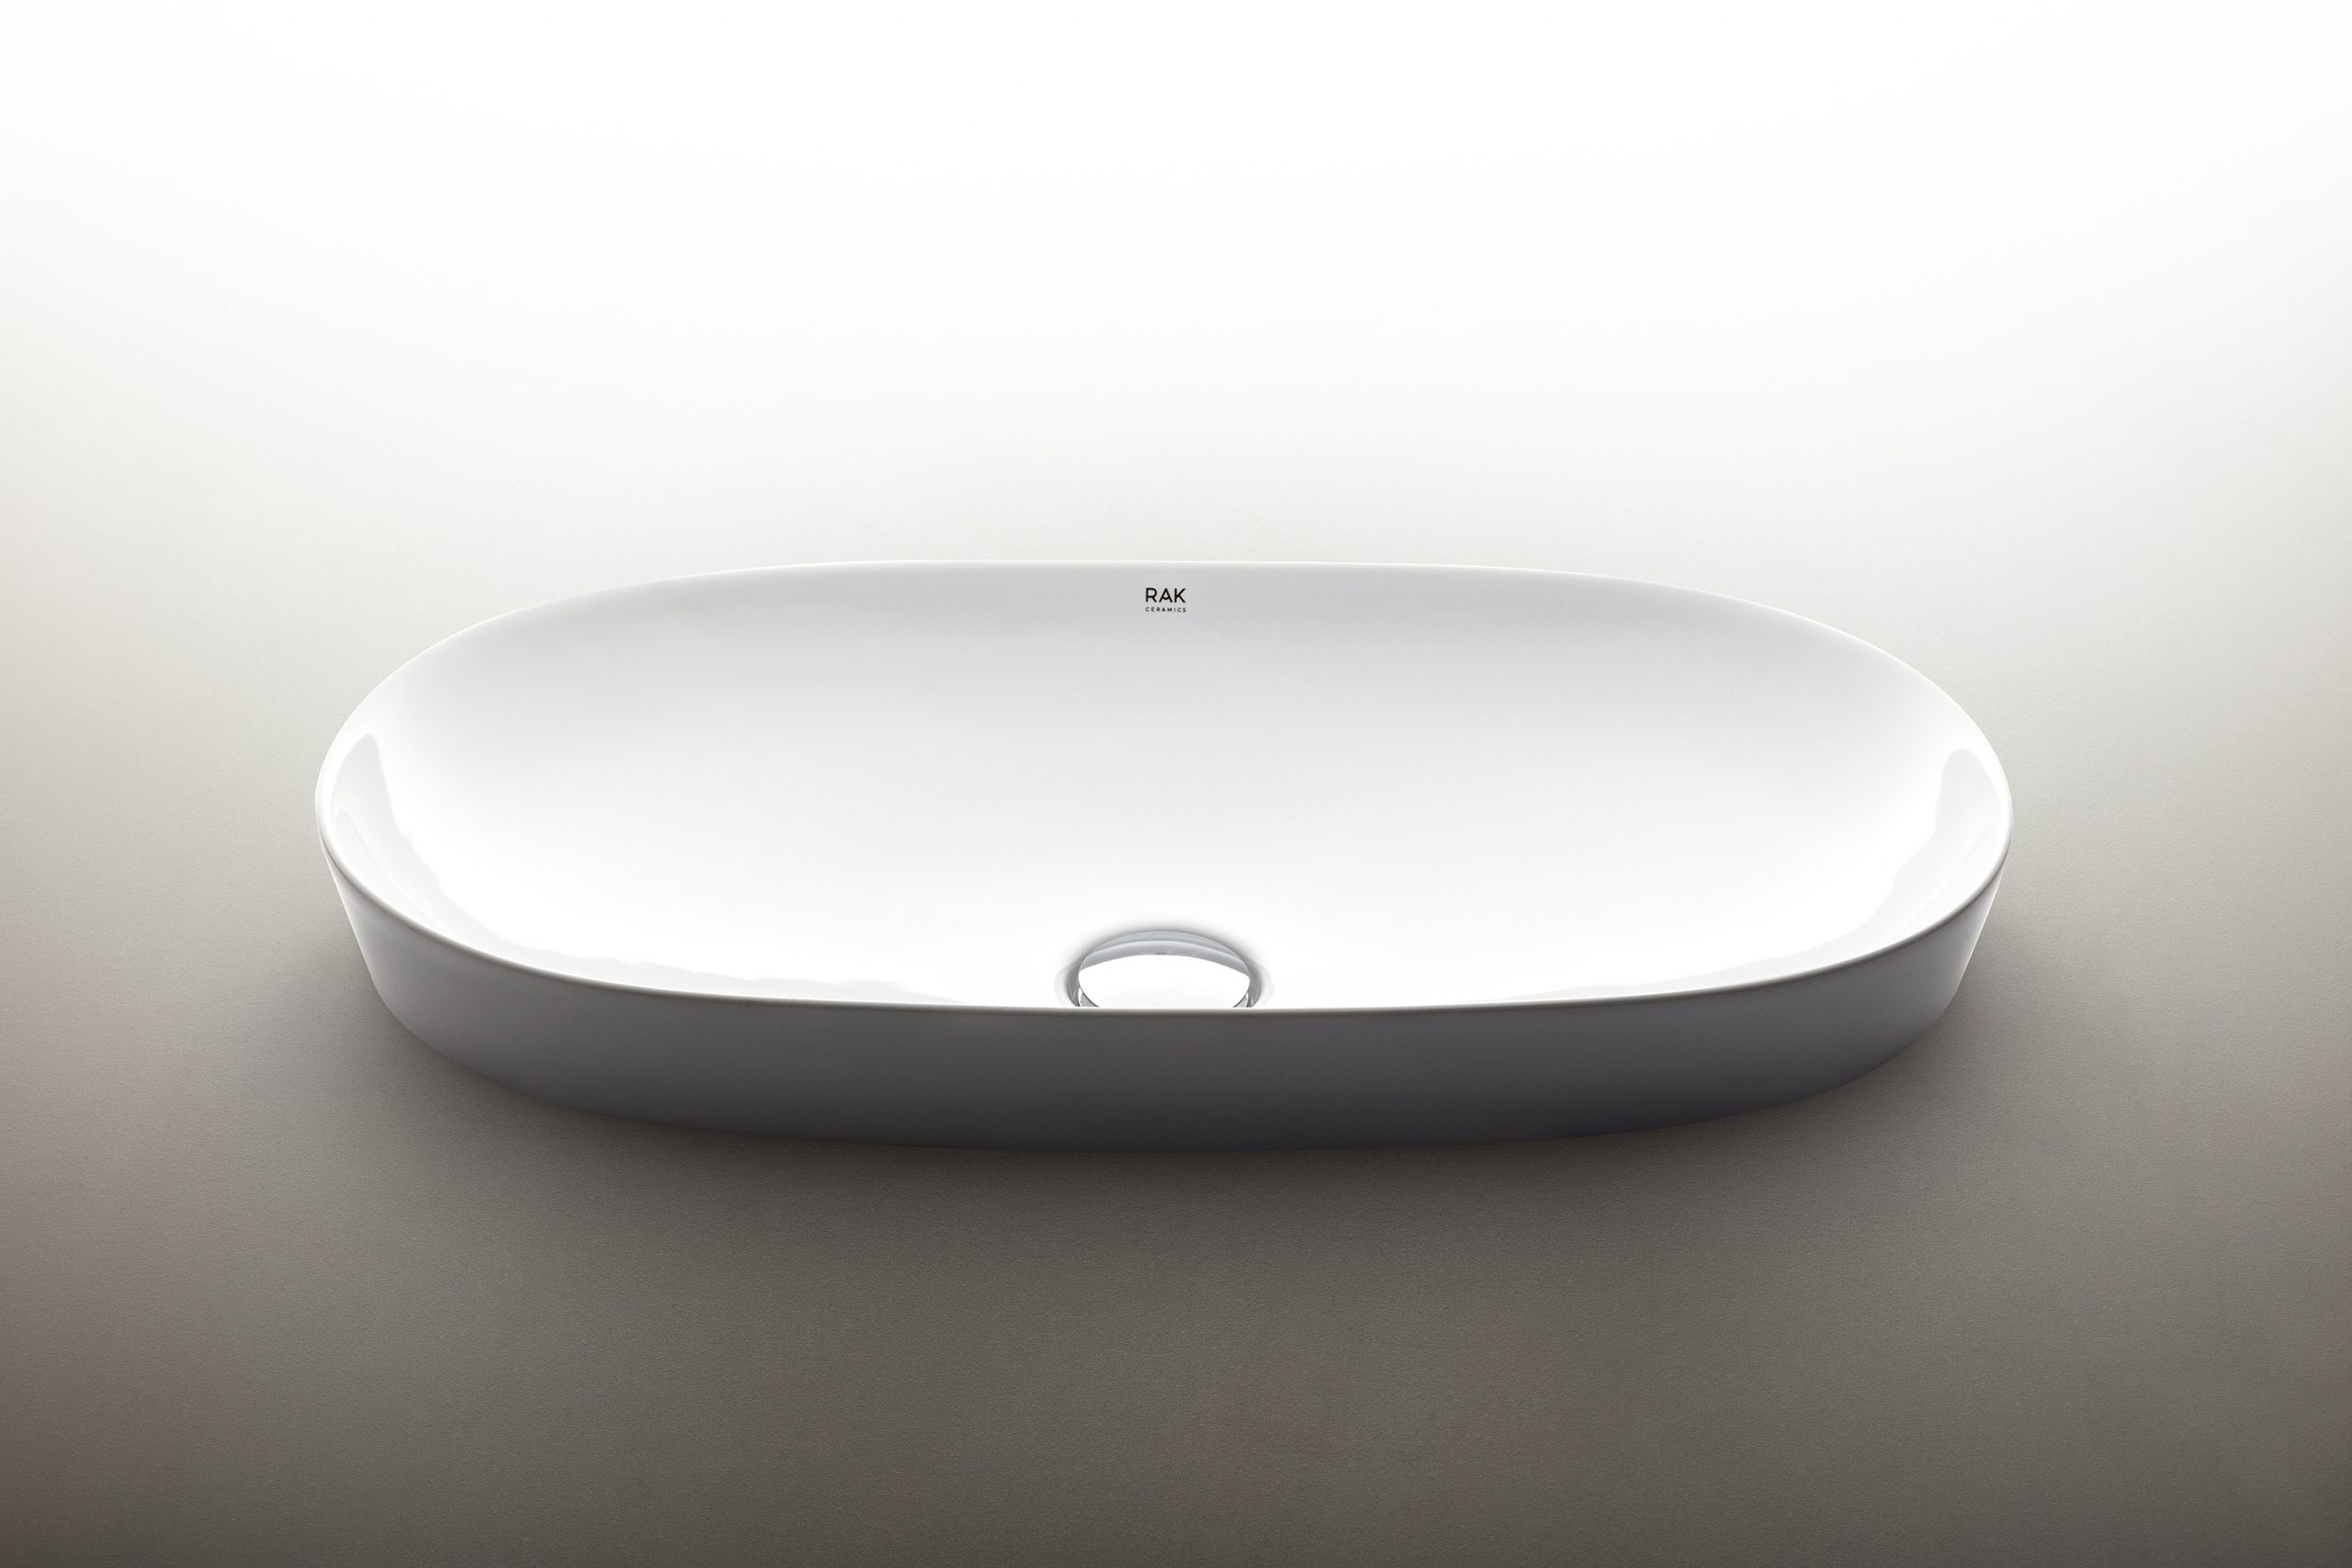 Oval Variant washbasin designed by Debiasi Sandri for RAK Ceramics